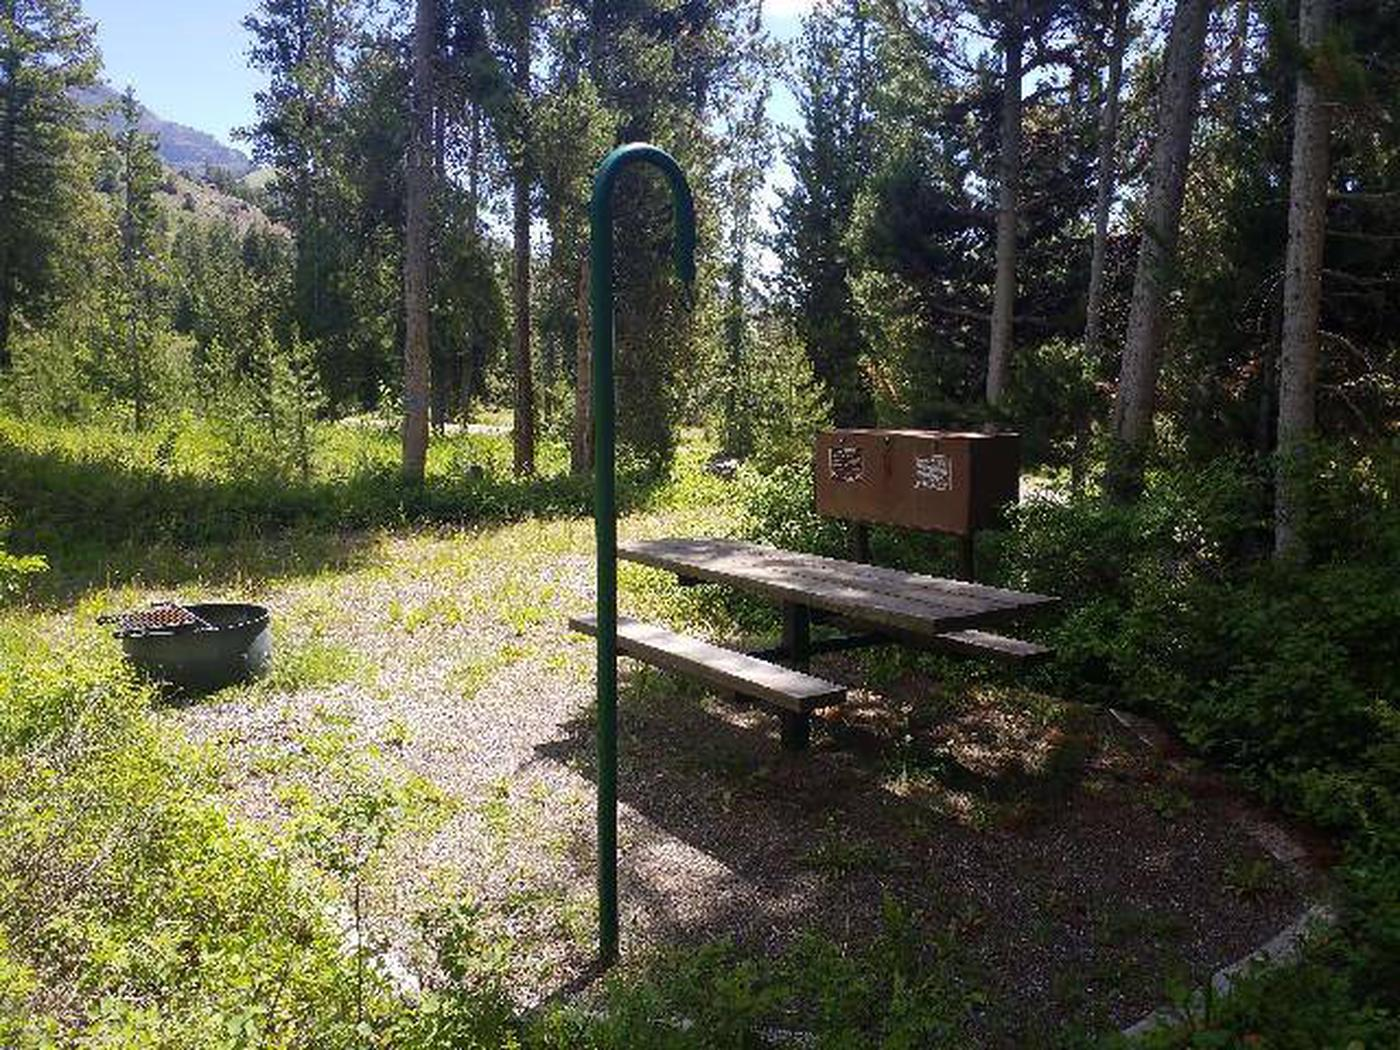 Threemile Campground Campsite 19 - Back View